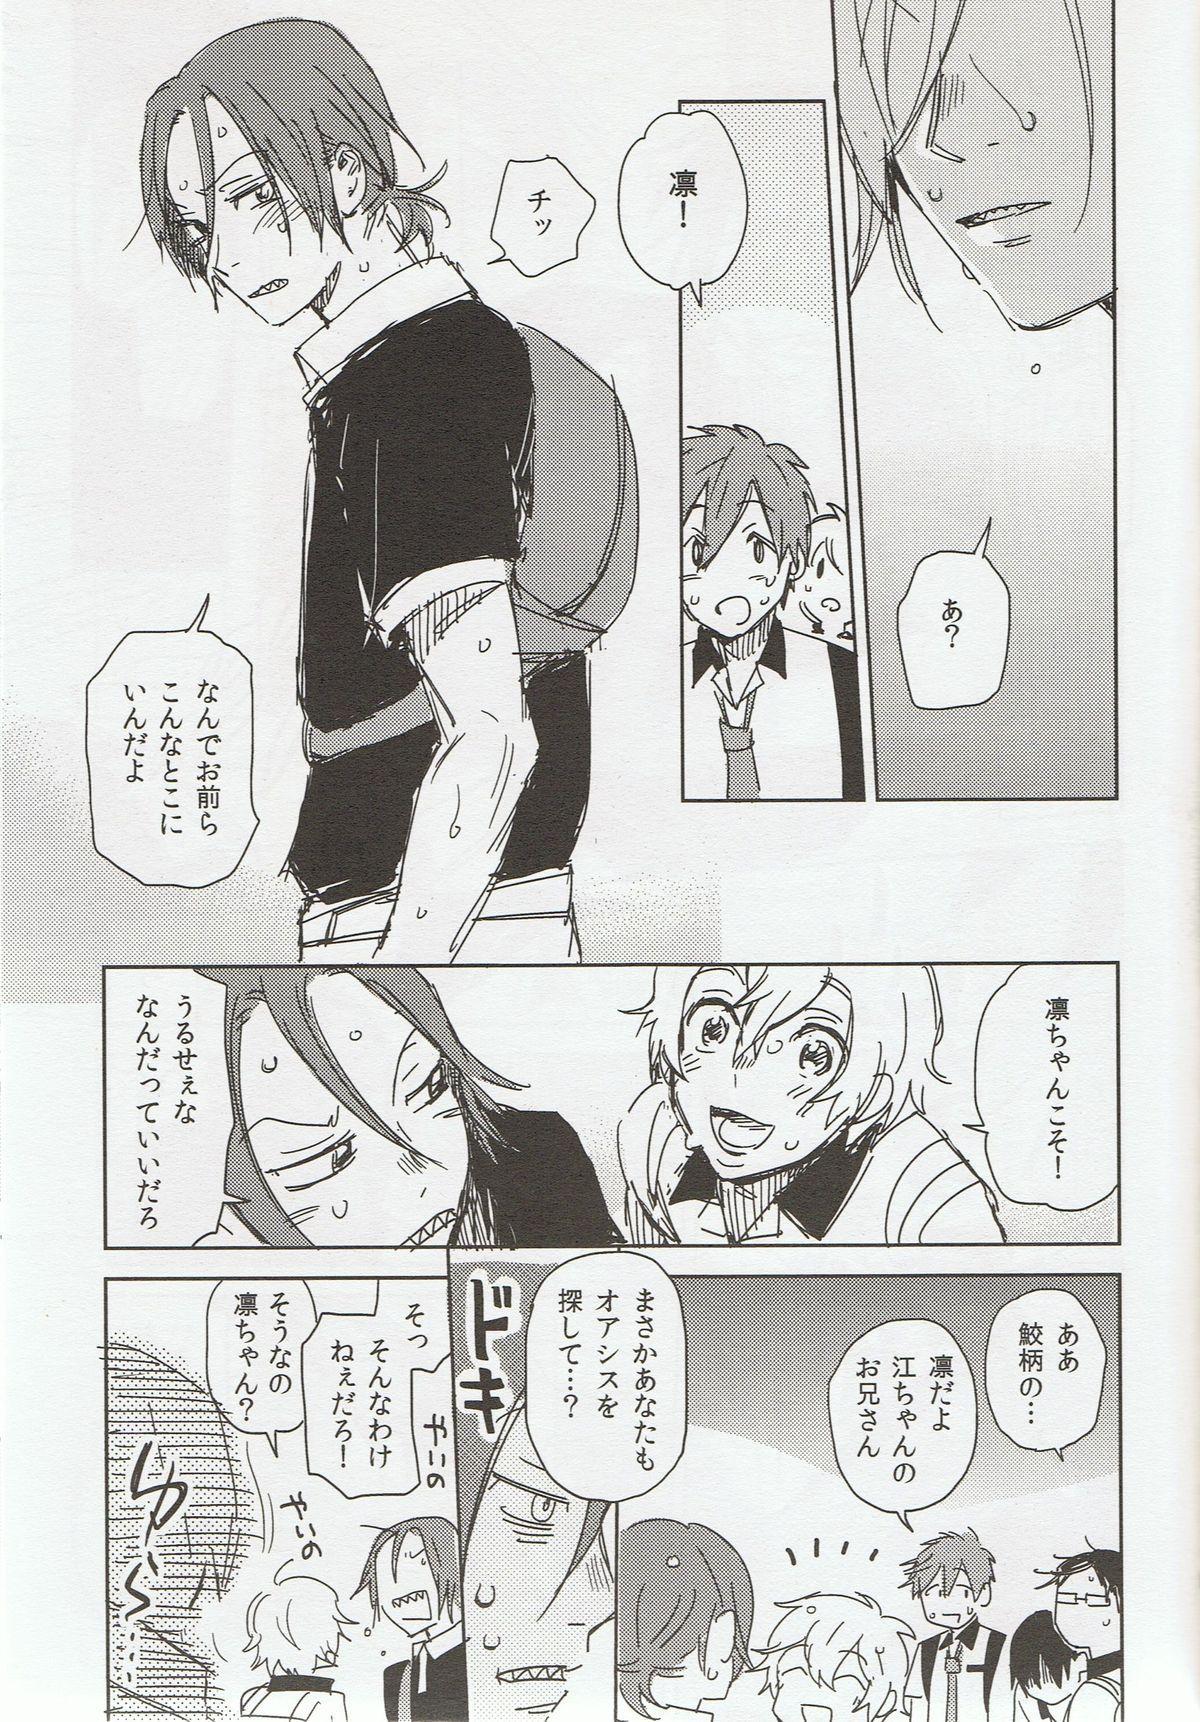 Sou da, Tottori Sakyuu Ikou. 11